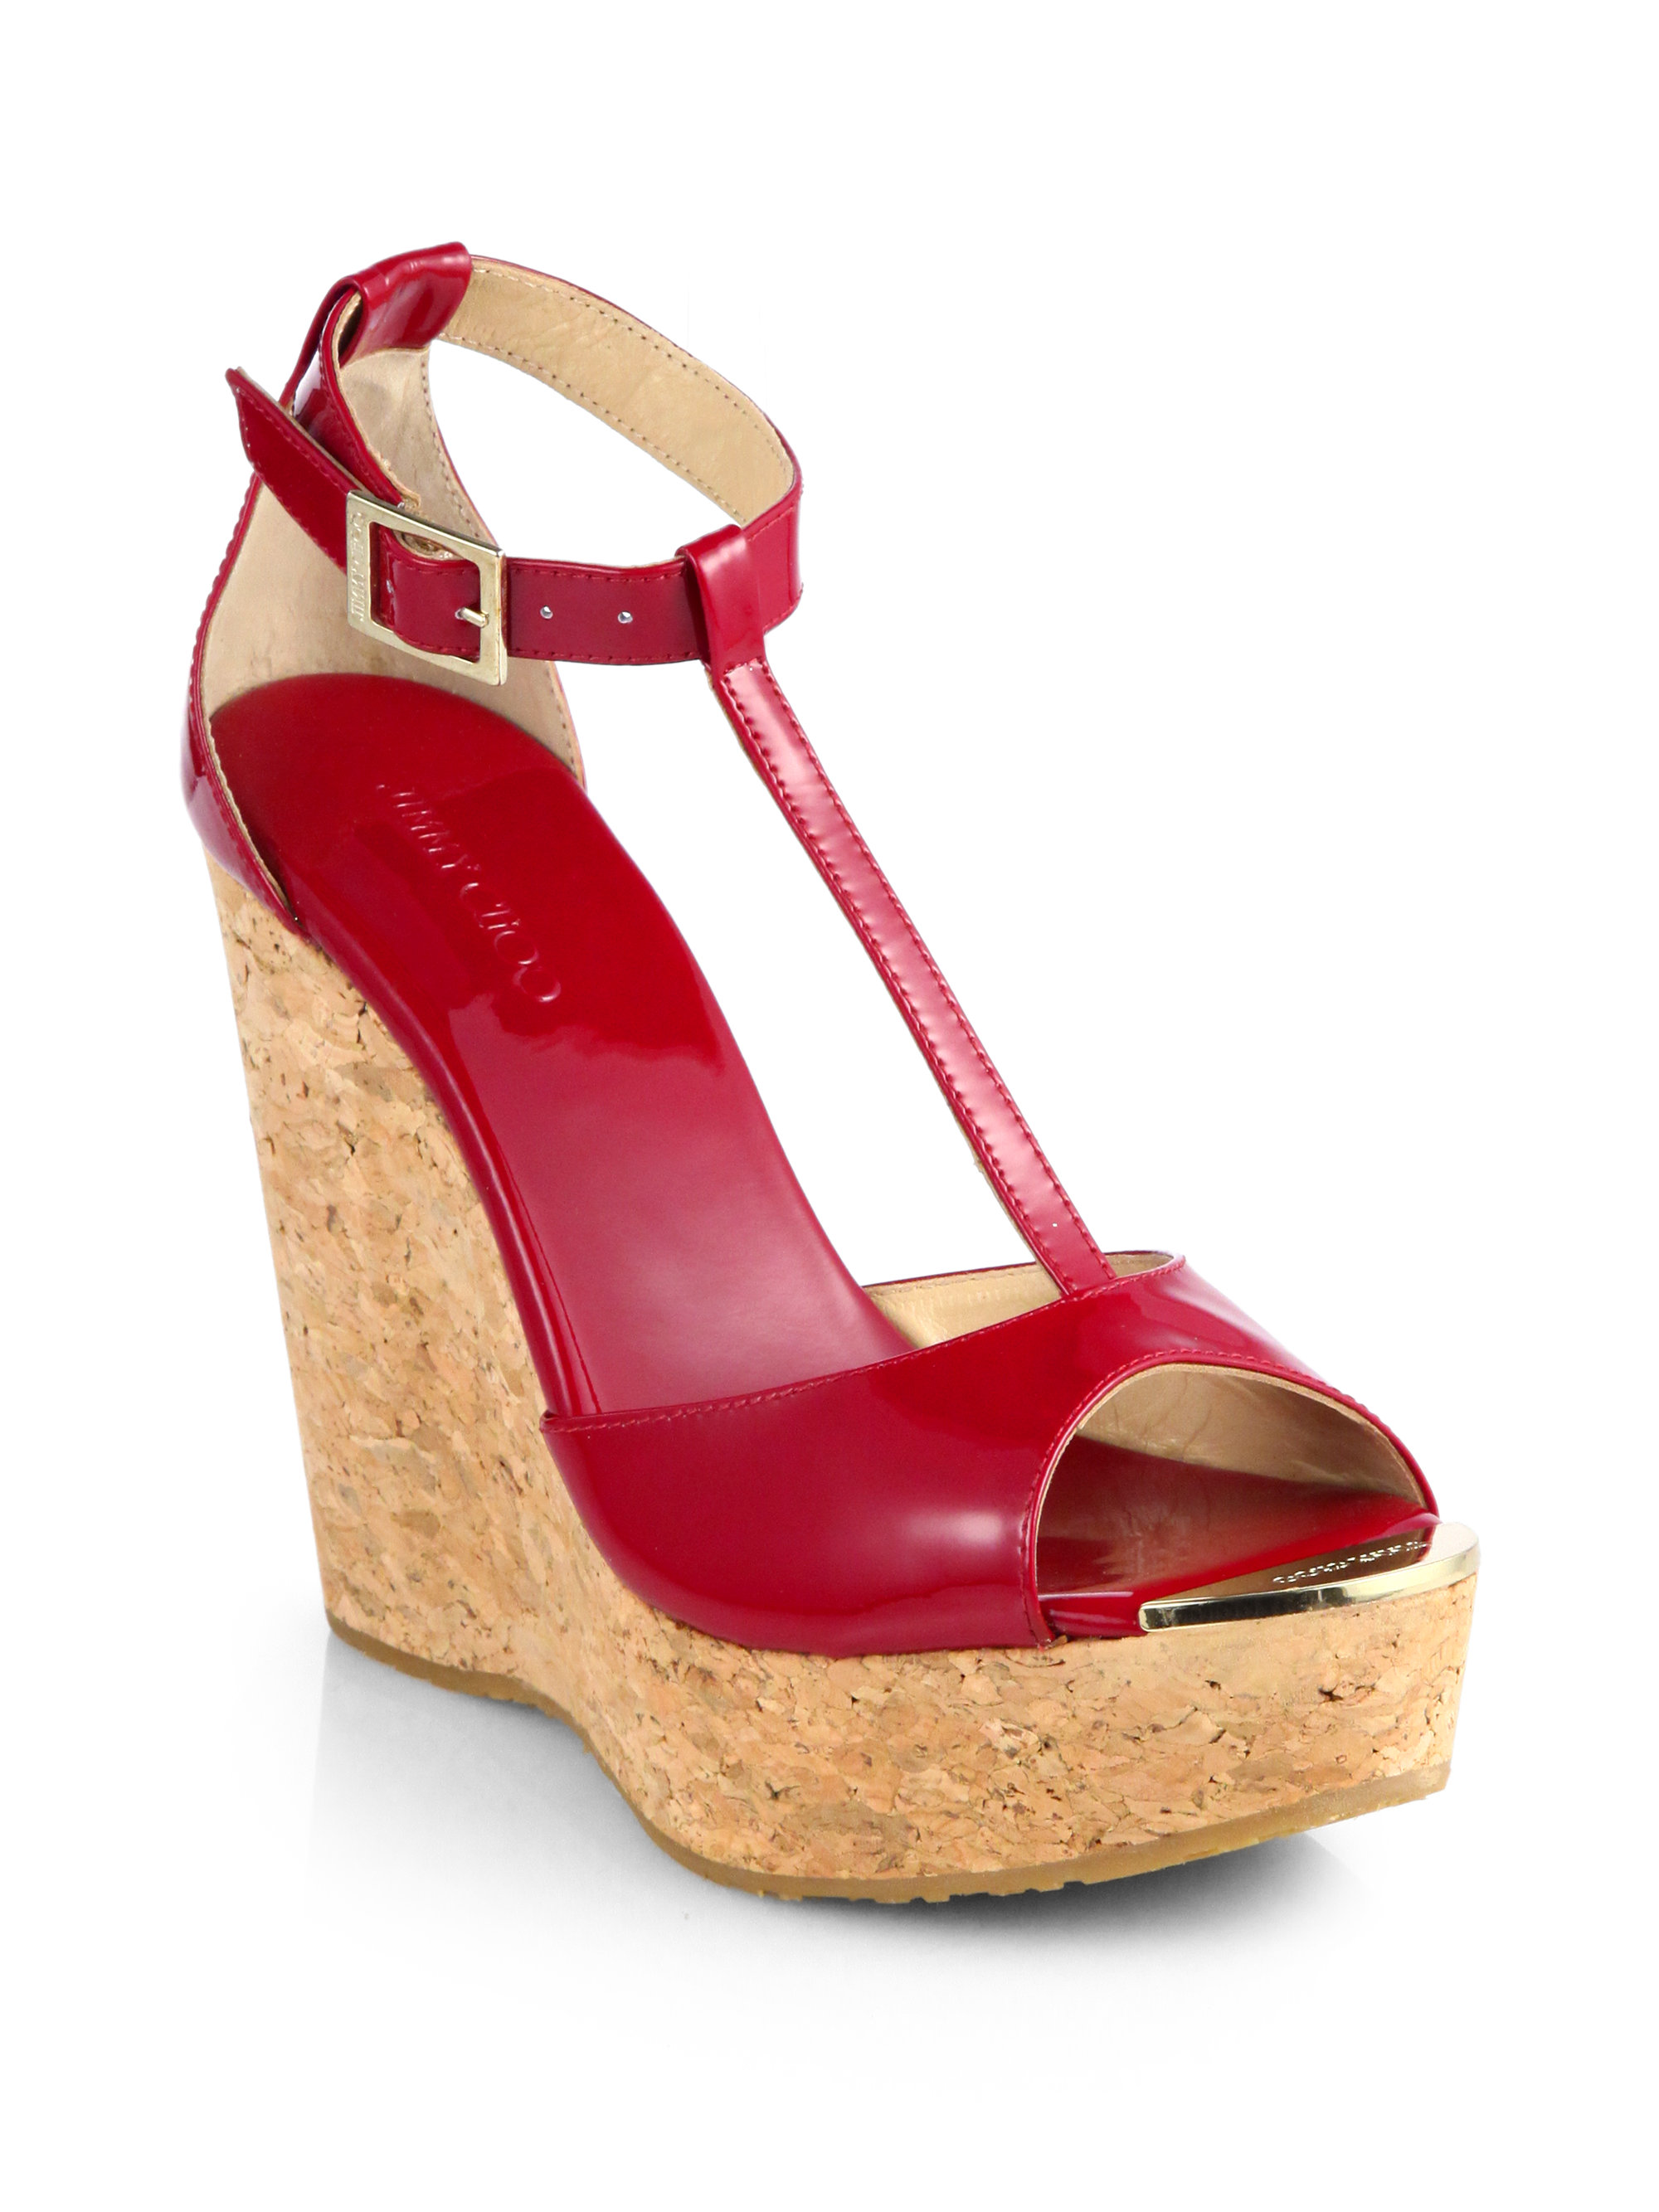 a56b67744b1 uk jimmy choo delaney platform wedge 4094f c9908  discount code for lyst  jimmy choo pela patent leather tstrap cork wedge sandals in red da50b